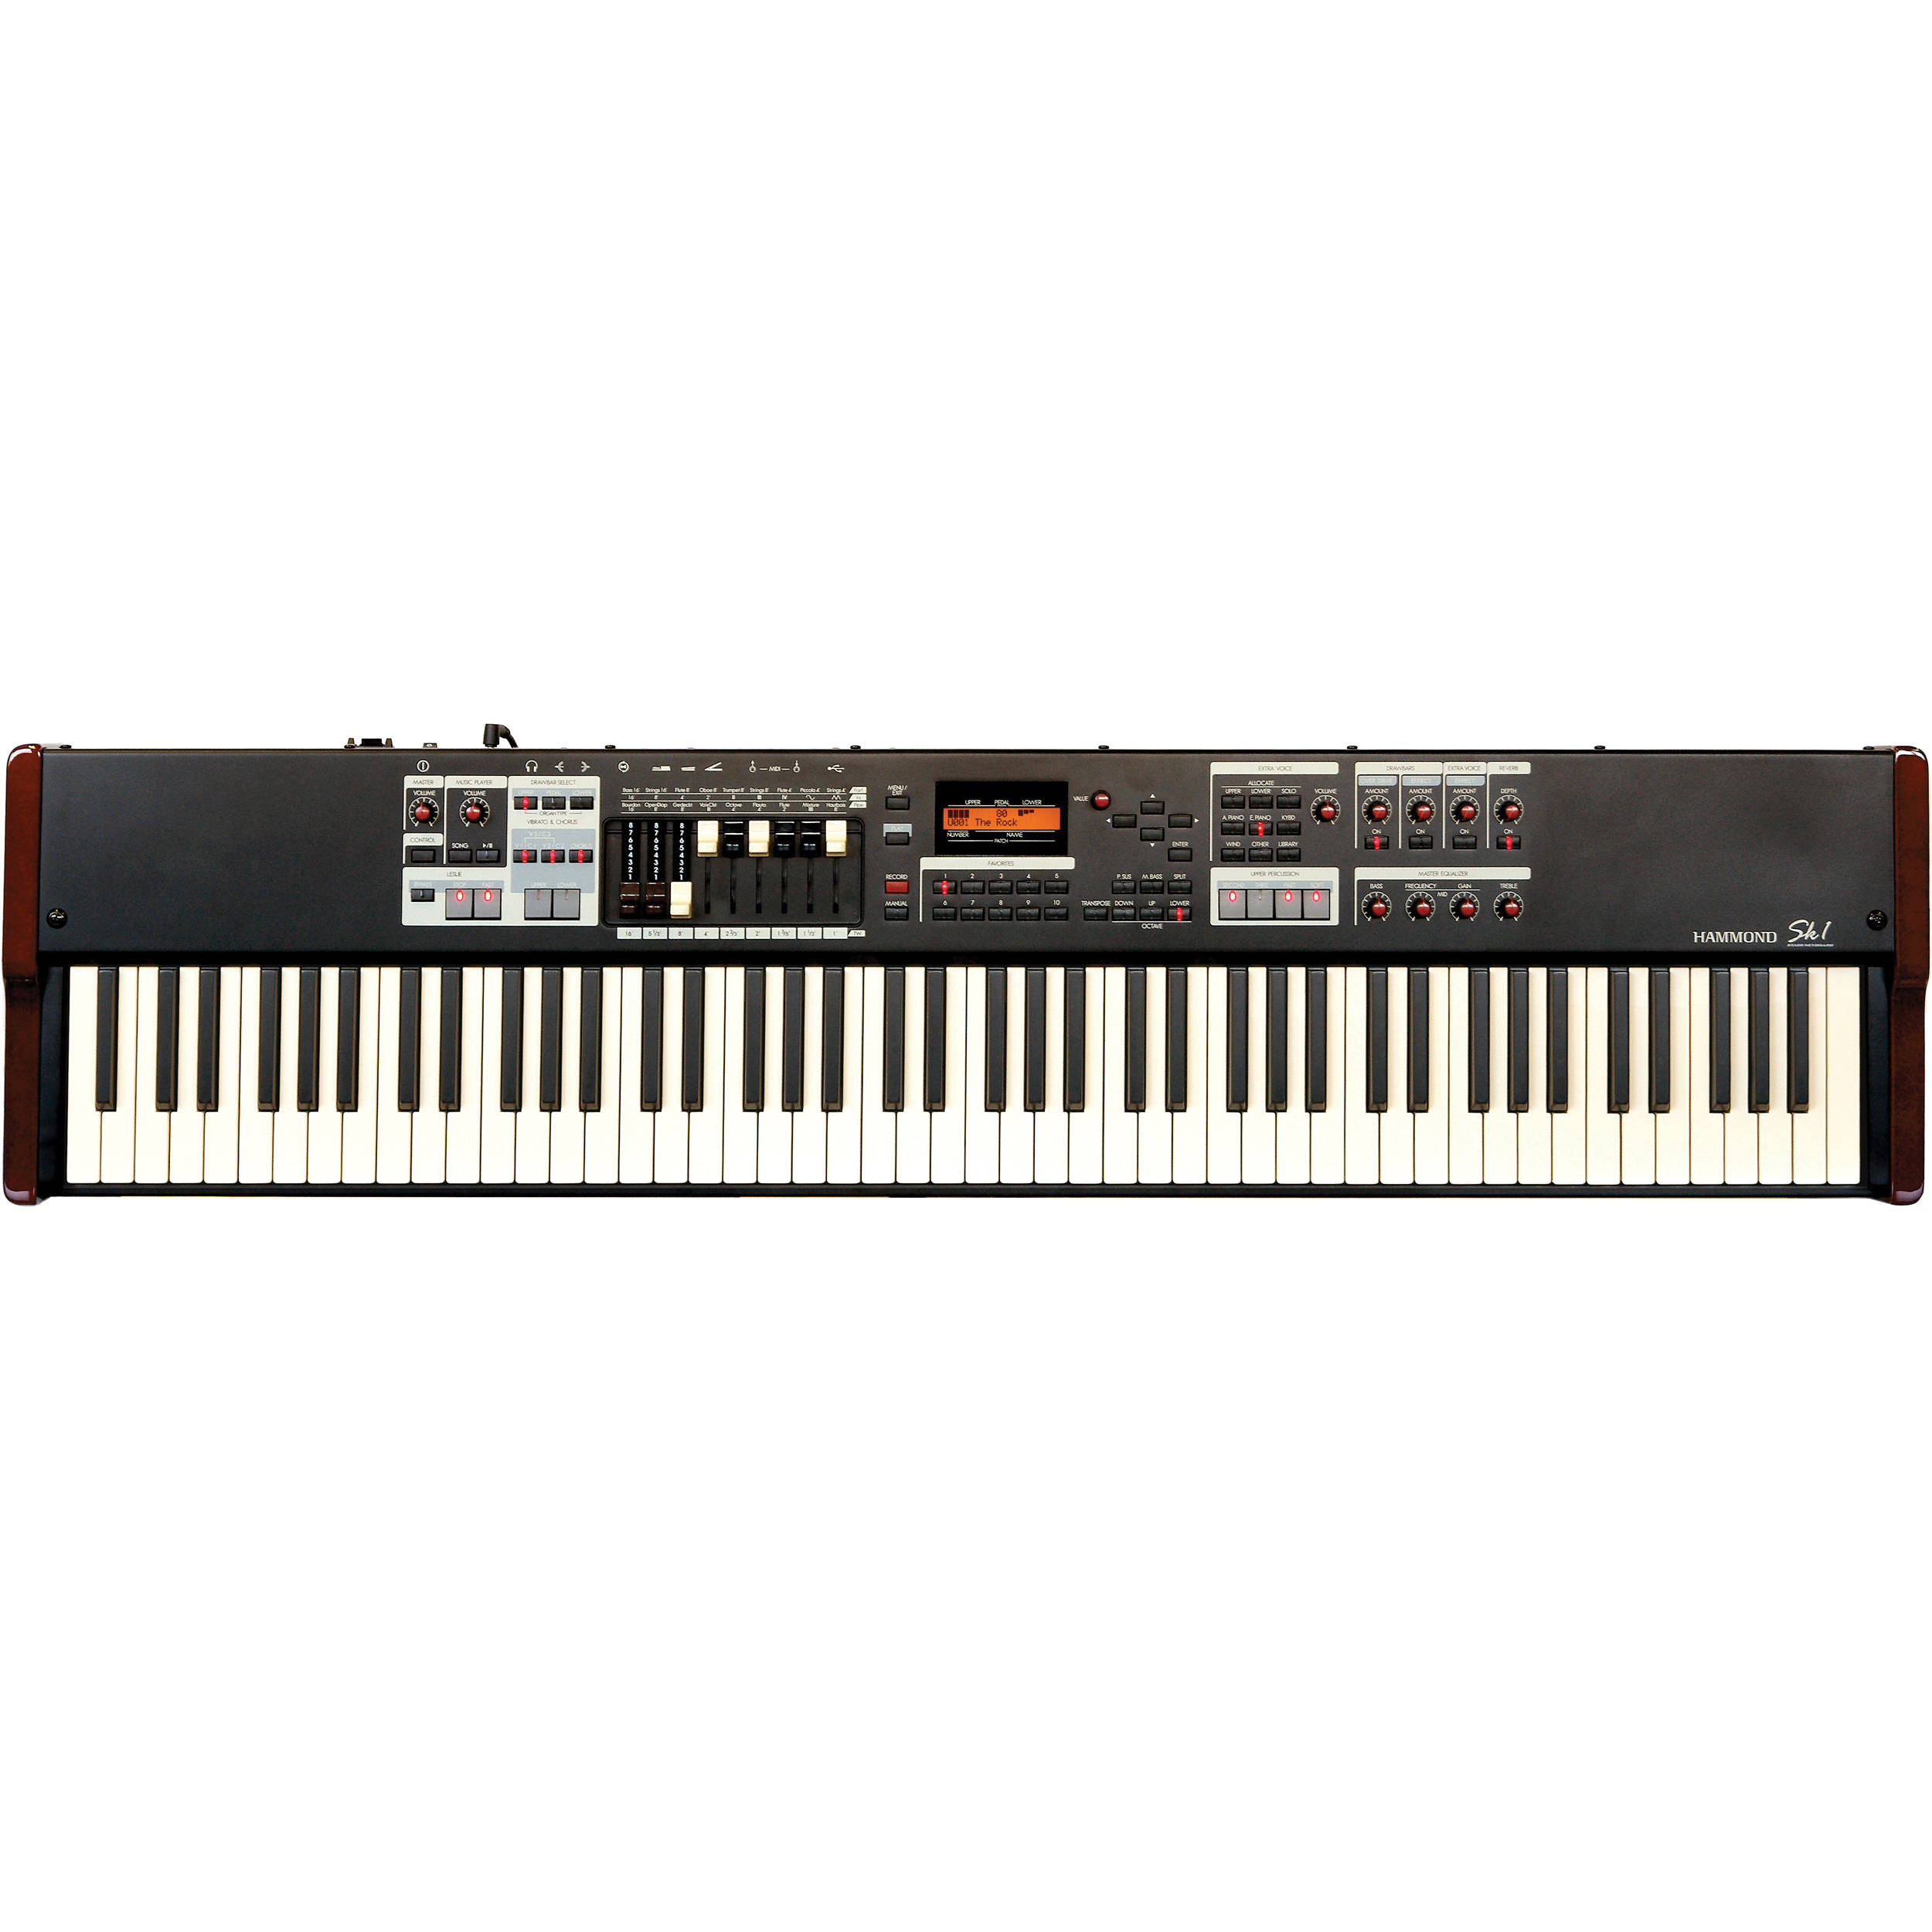 hammond sk1 88 portable hammond organ and stage keyboard burgundy black. Black Bedroom Furniture Sets. Home Design Ideas